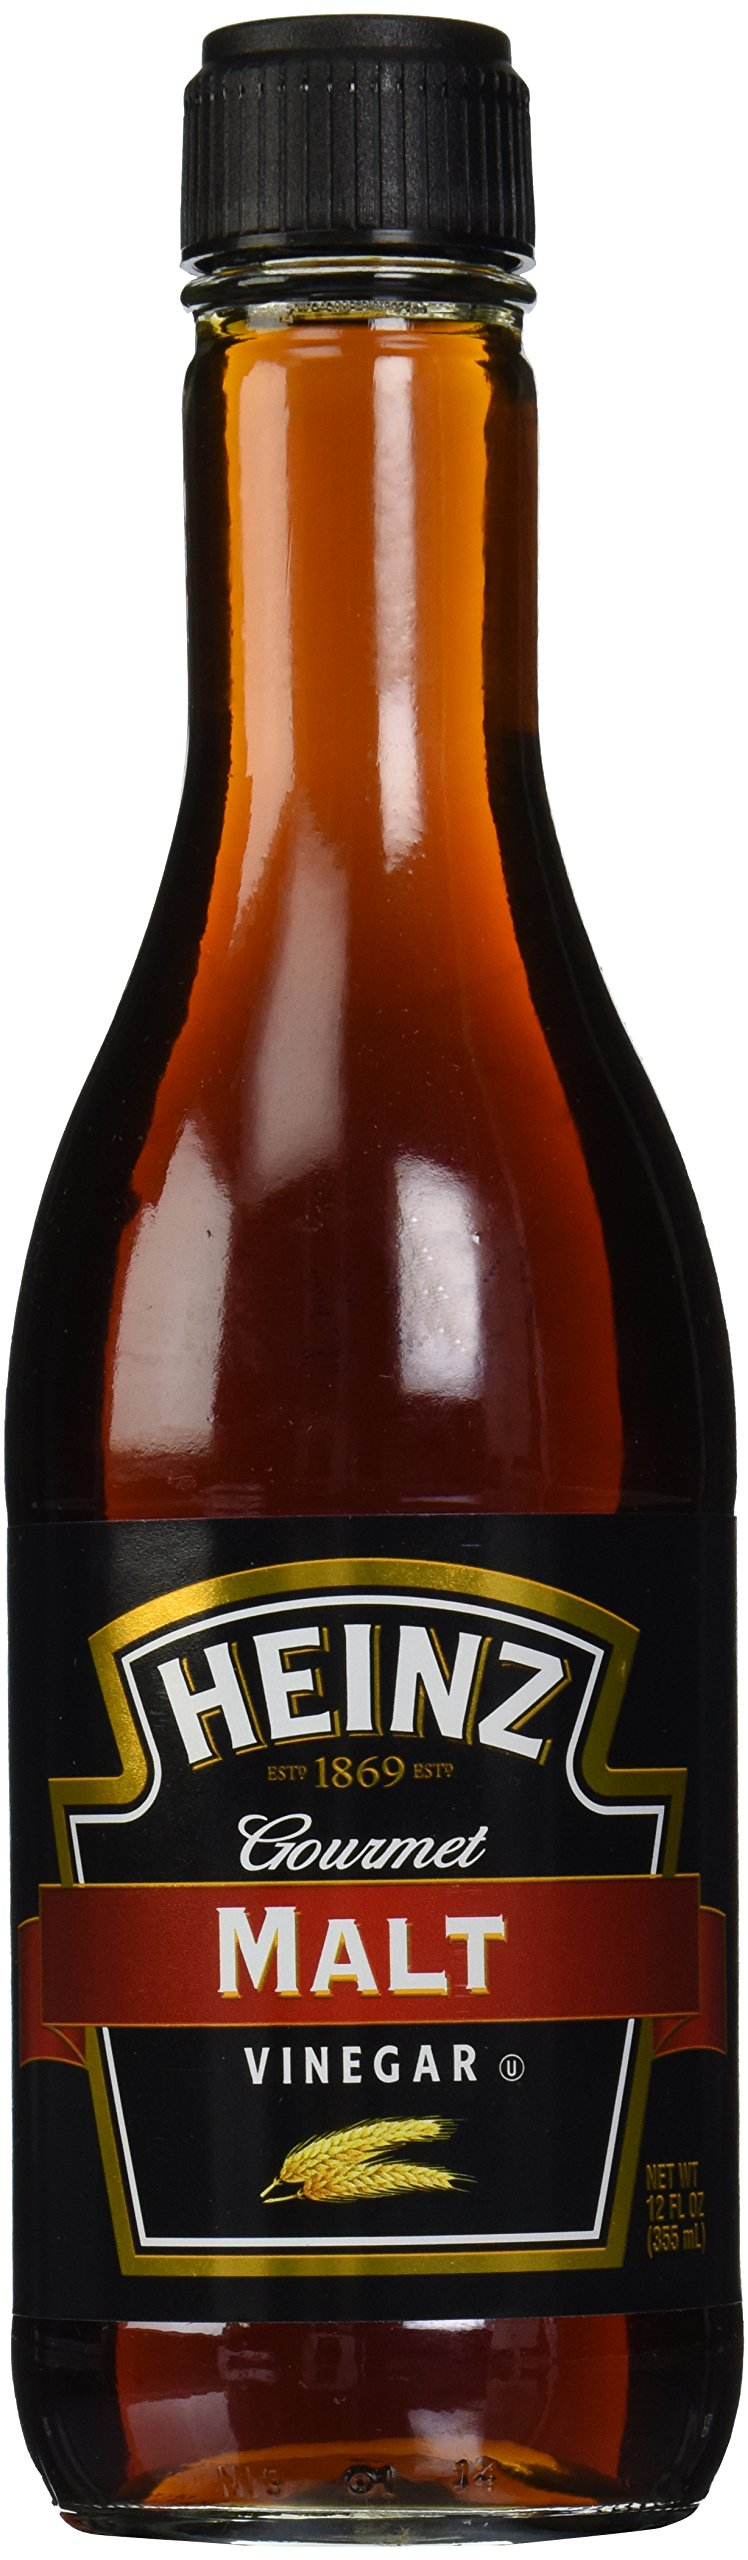 Heinz Malt Vinegar, 12 fl oz